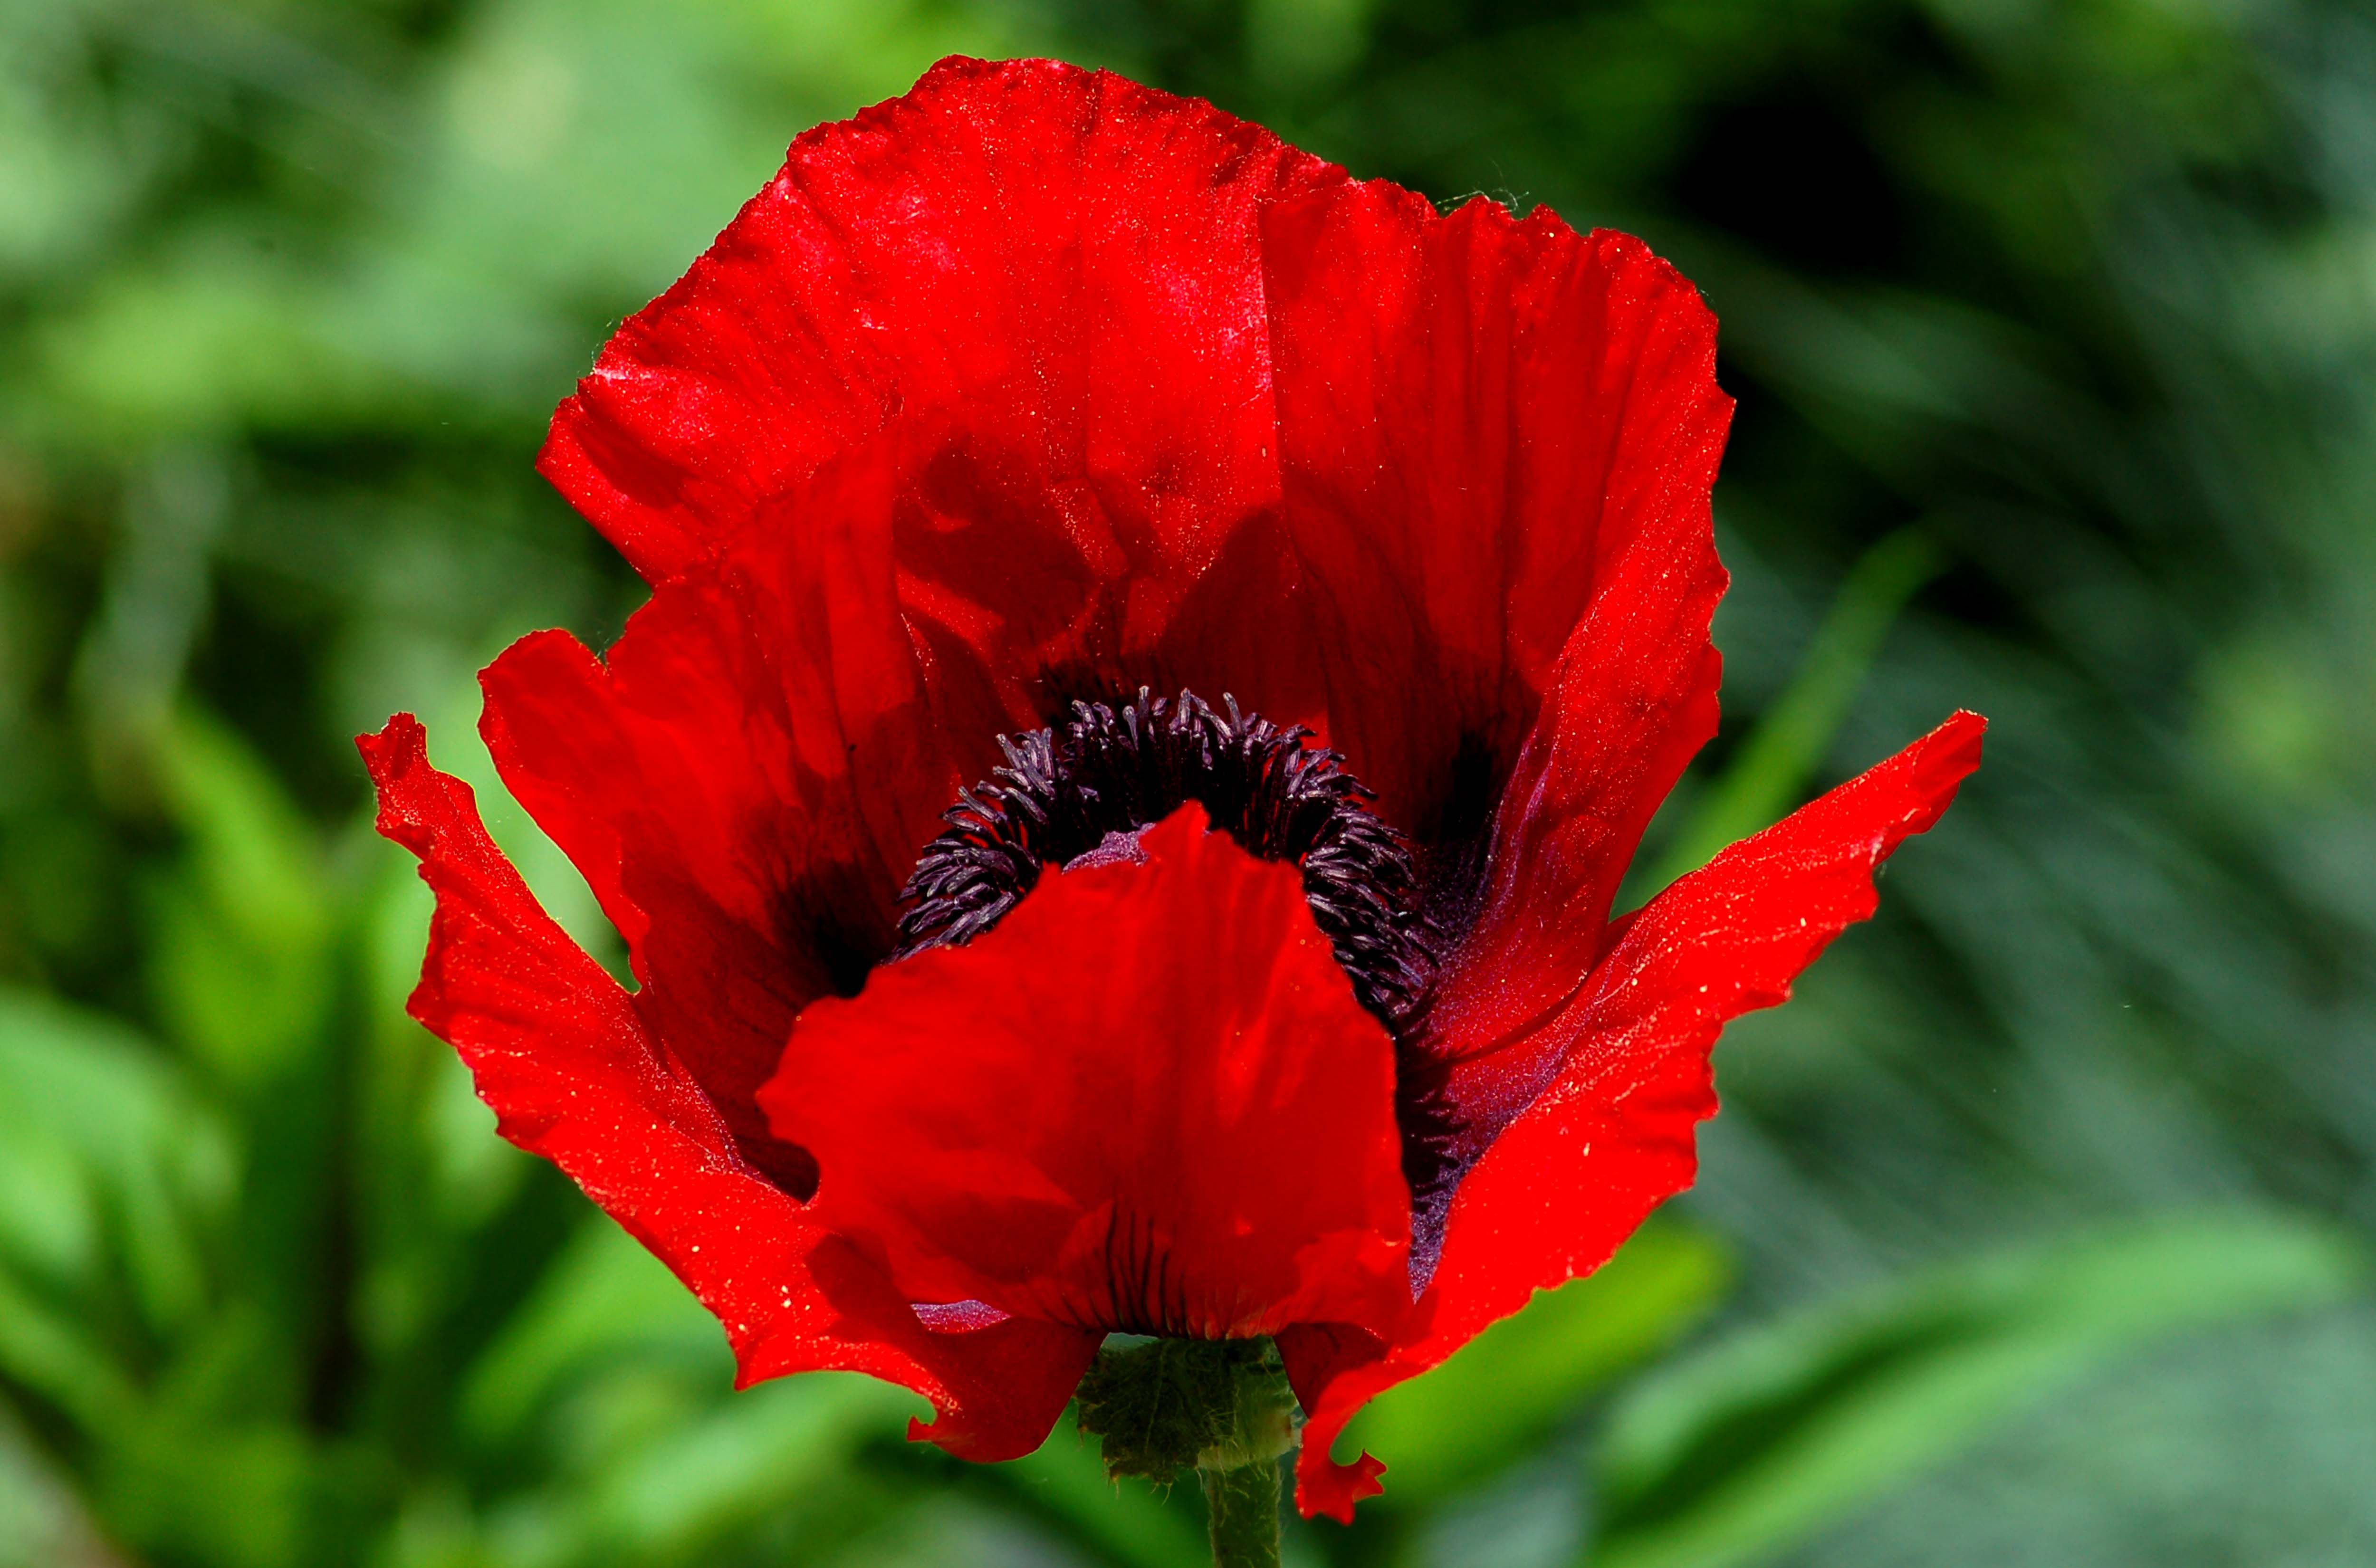 Flower of Beauty-of-Livermere poppy.